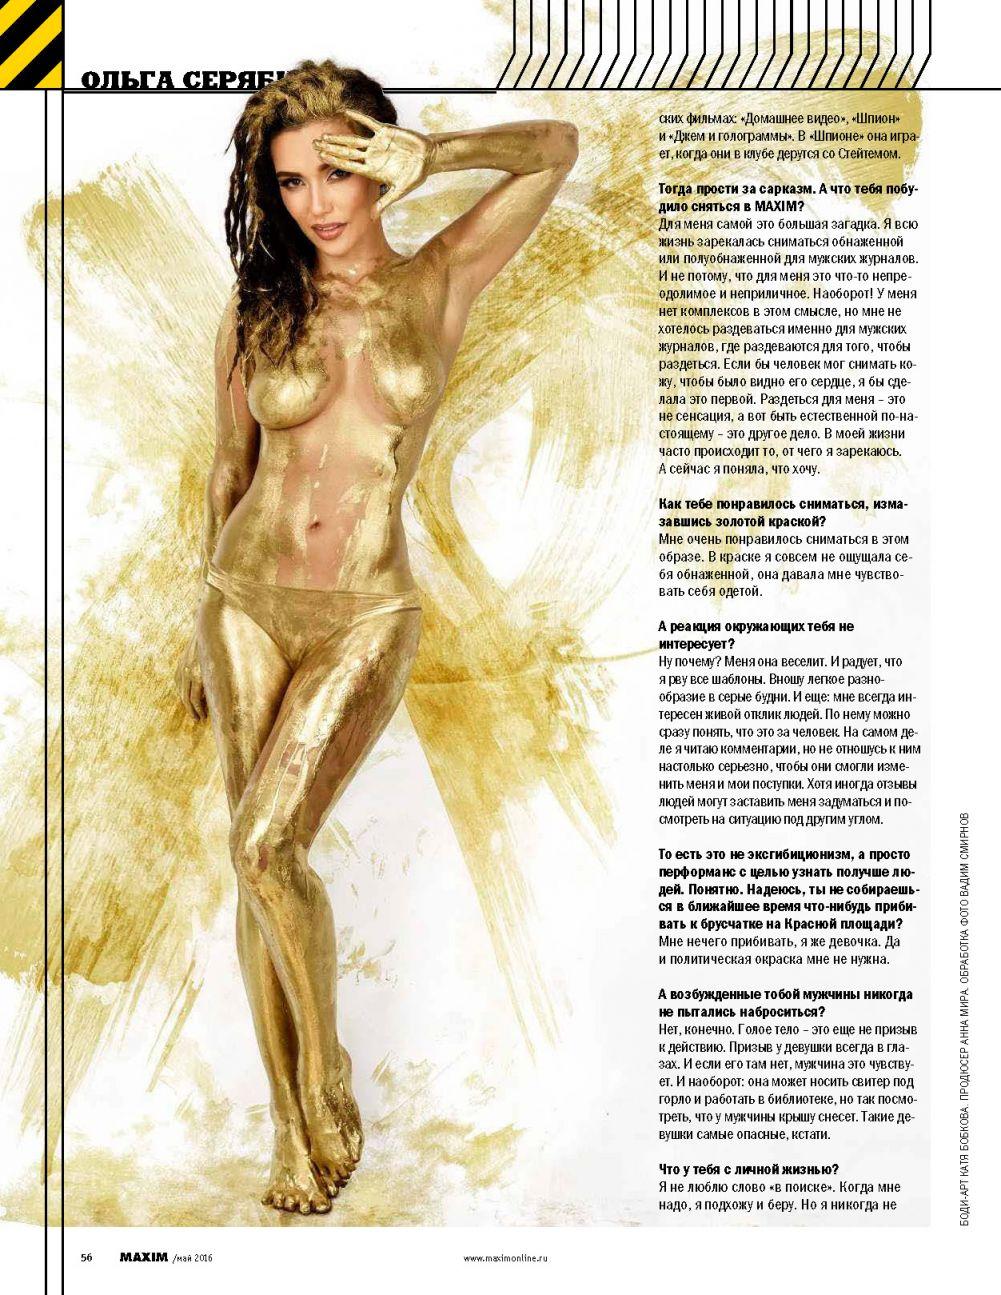 Olga Seryabkina nude (4)